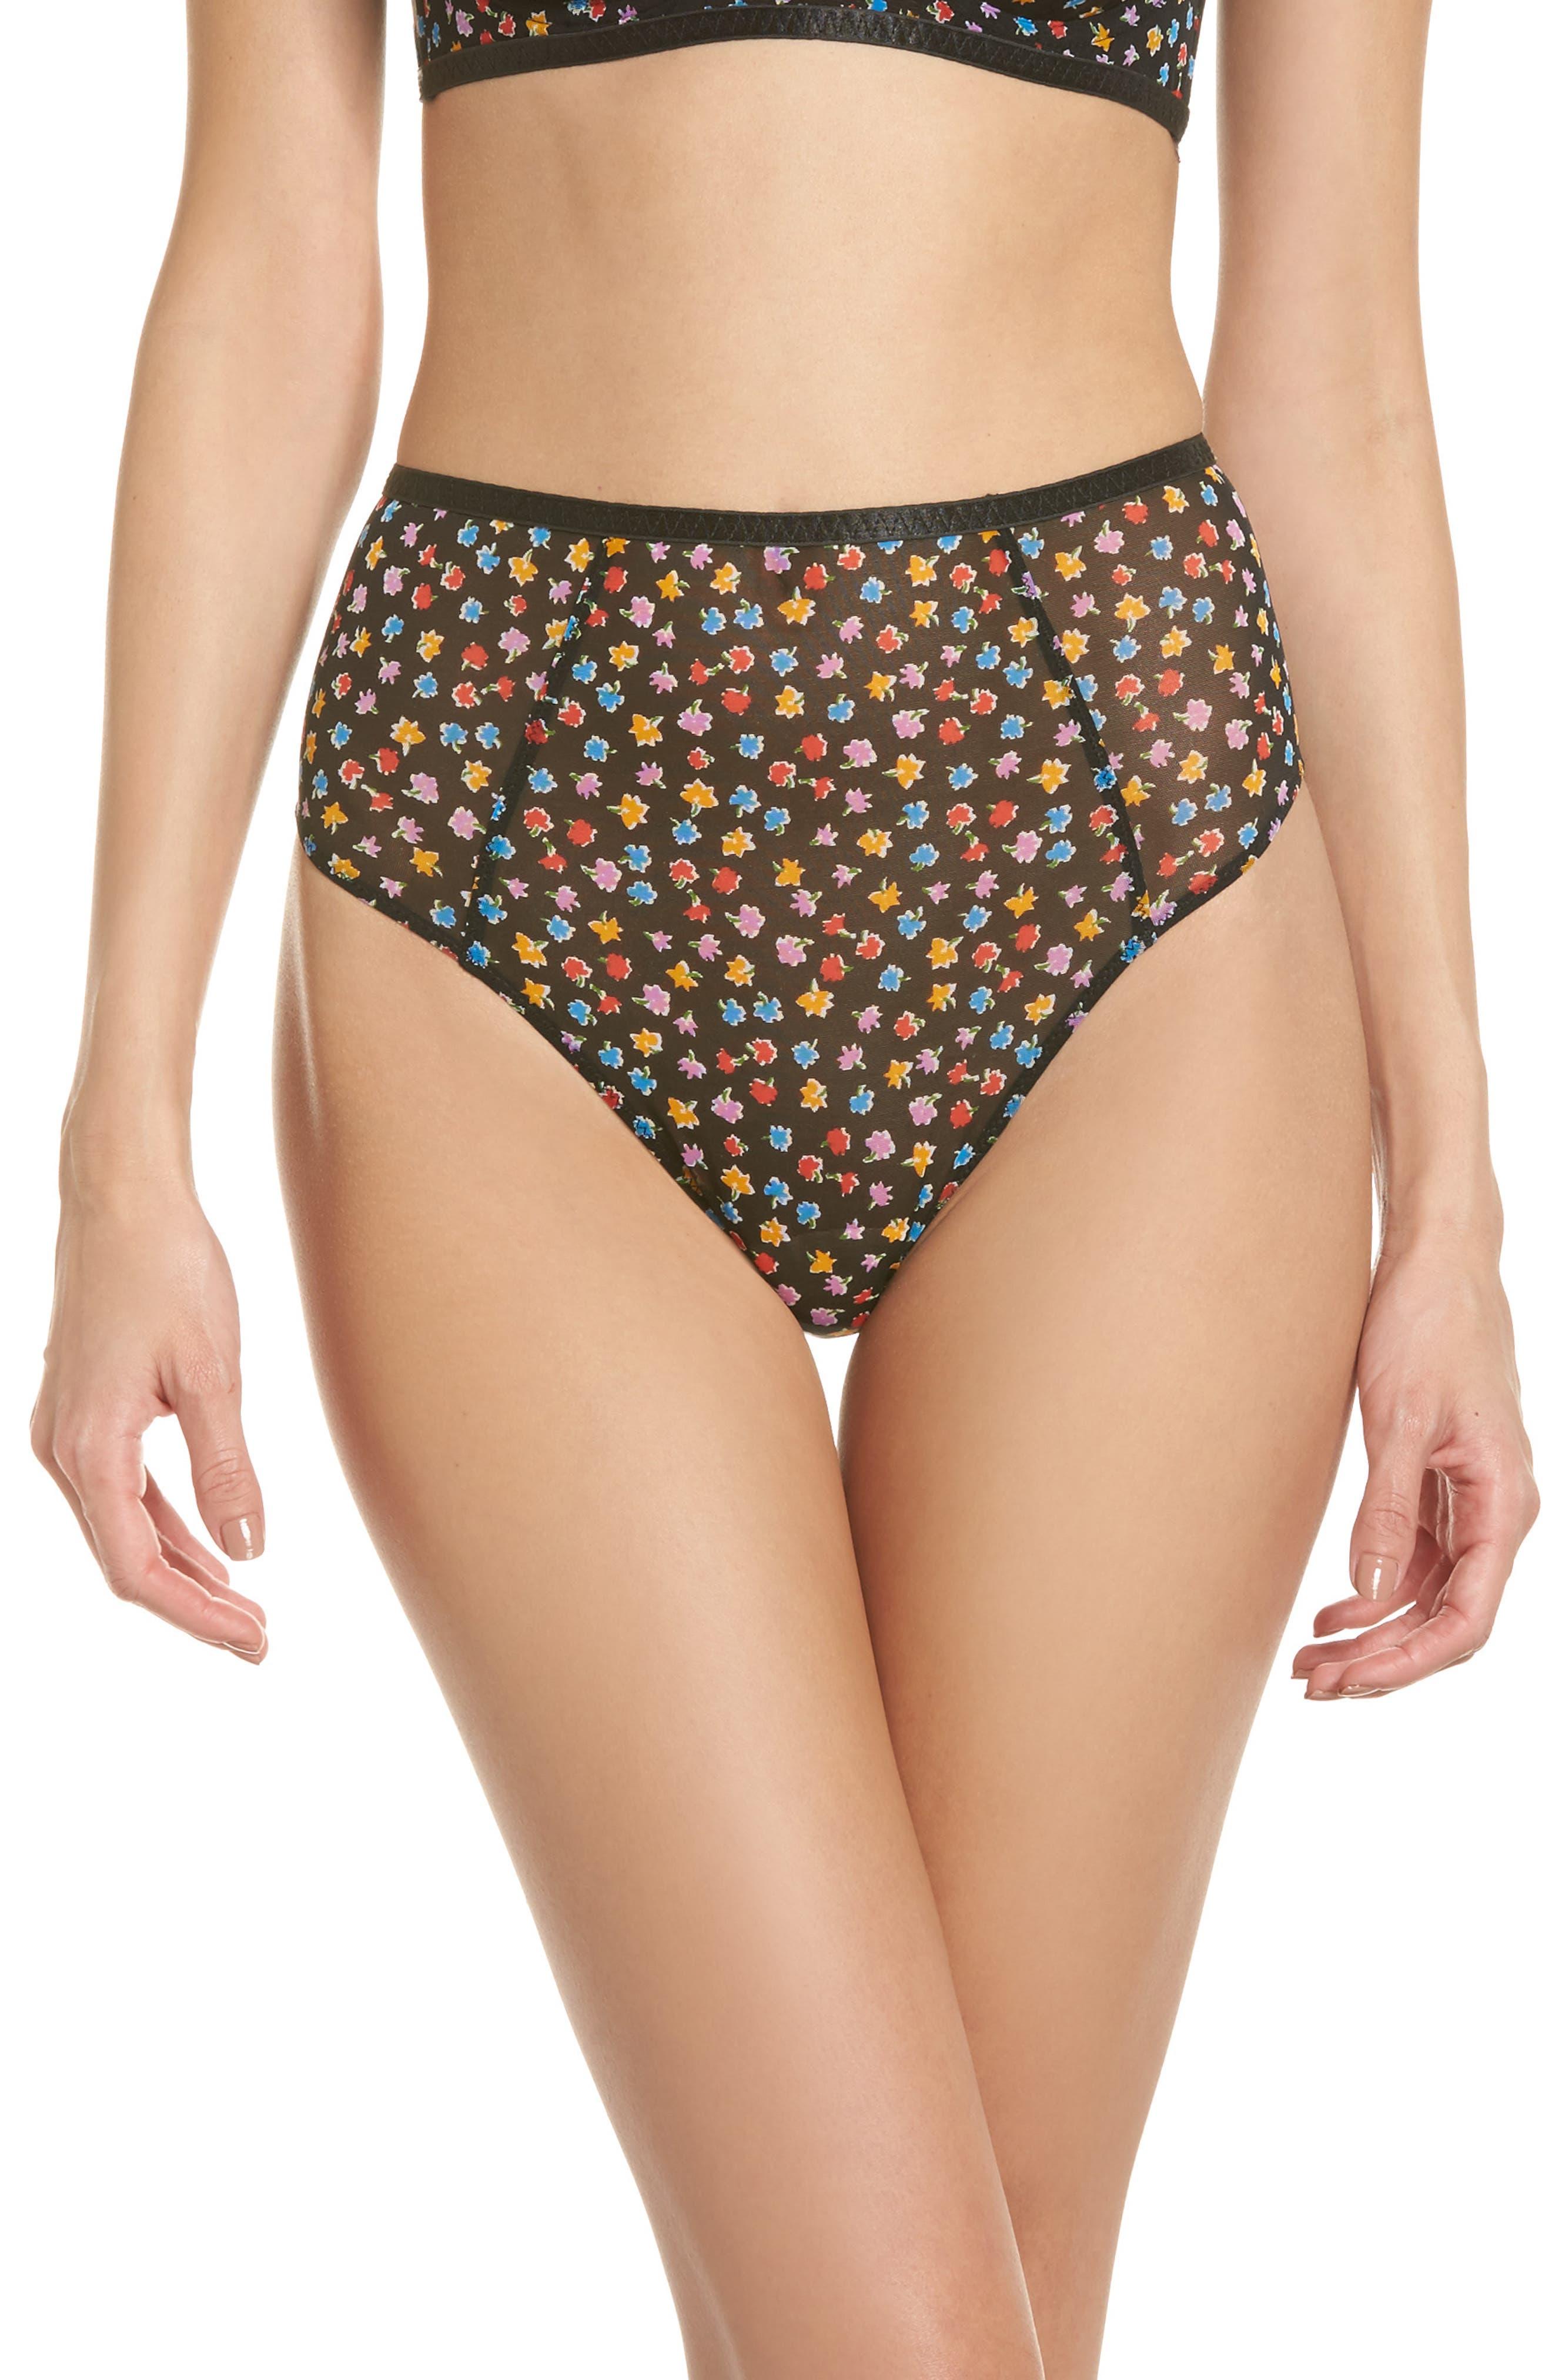 Intimately FP Capri High Waist Panties,                         Main,                         color, 019